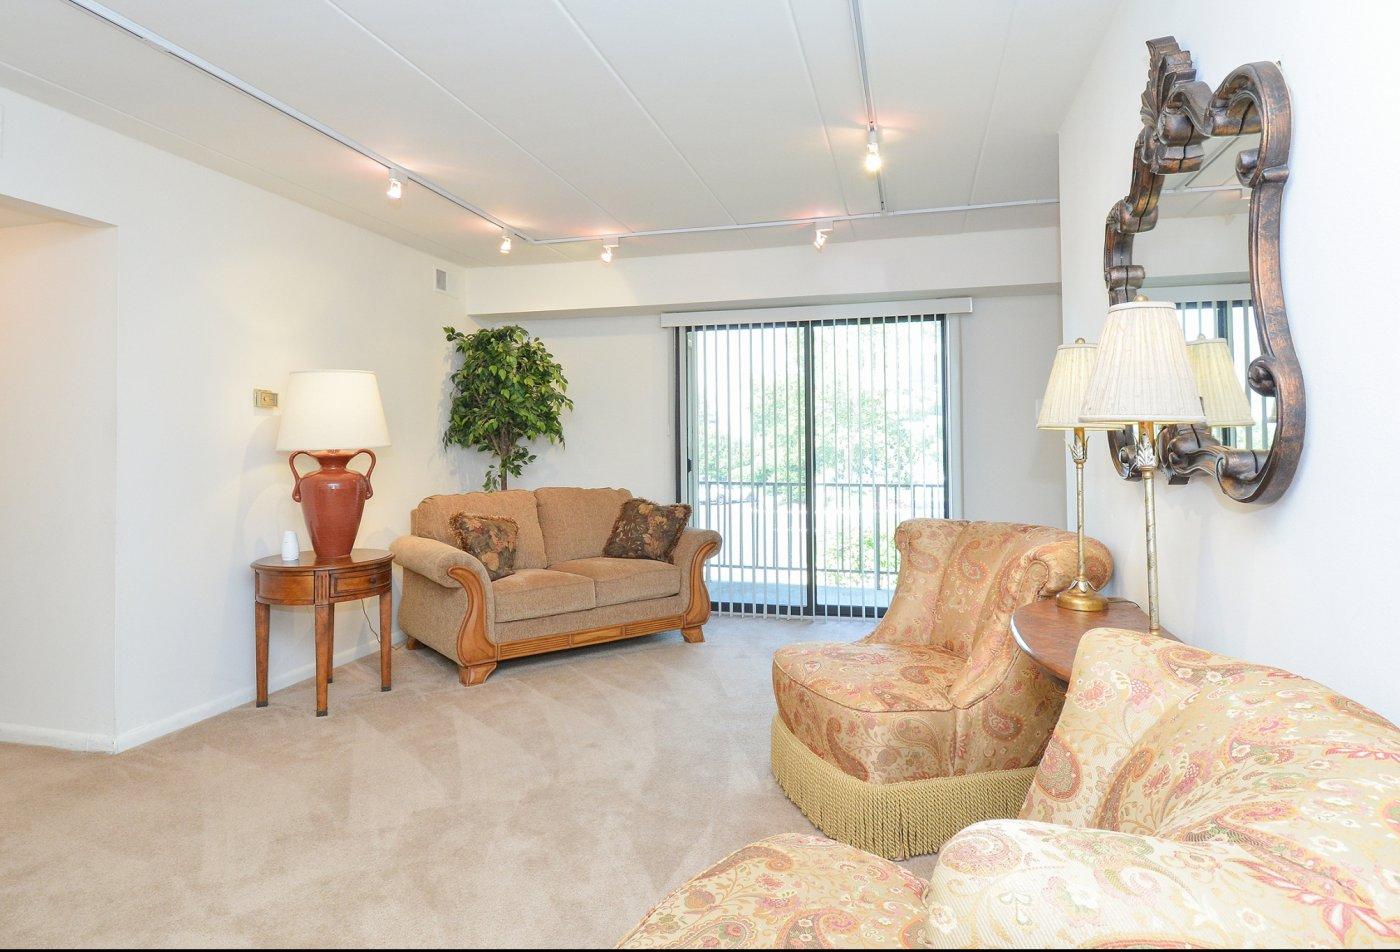 Spacious Living Room   Apartments in Wilmington, DE   Fairway Park Apartments & Townhomes